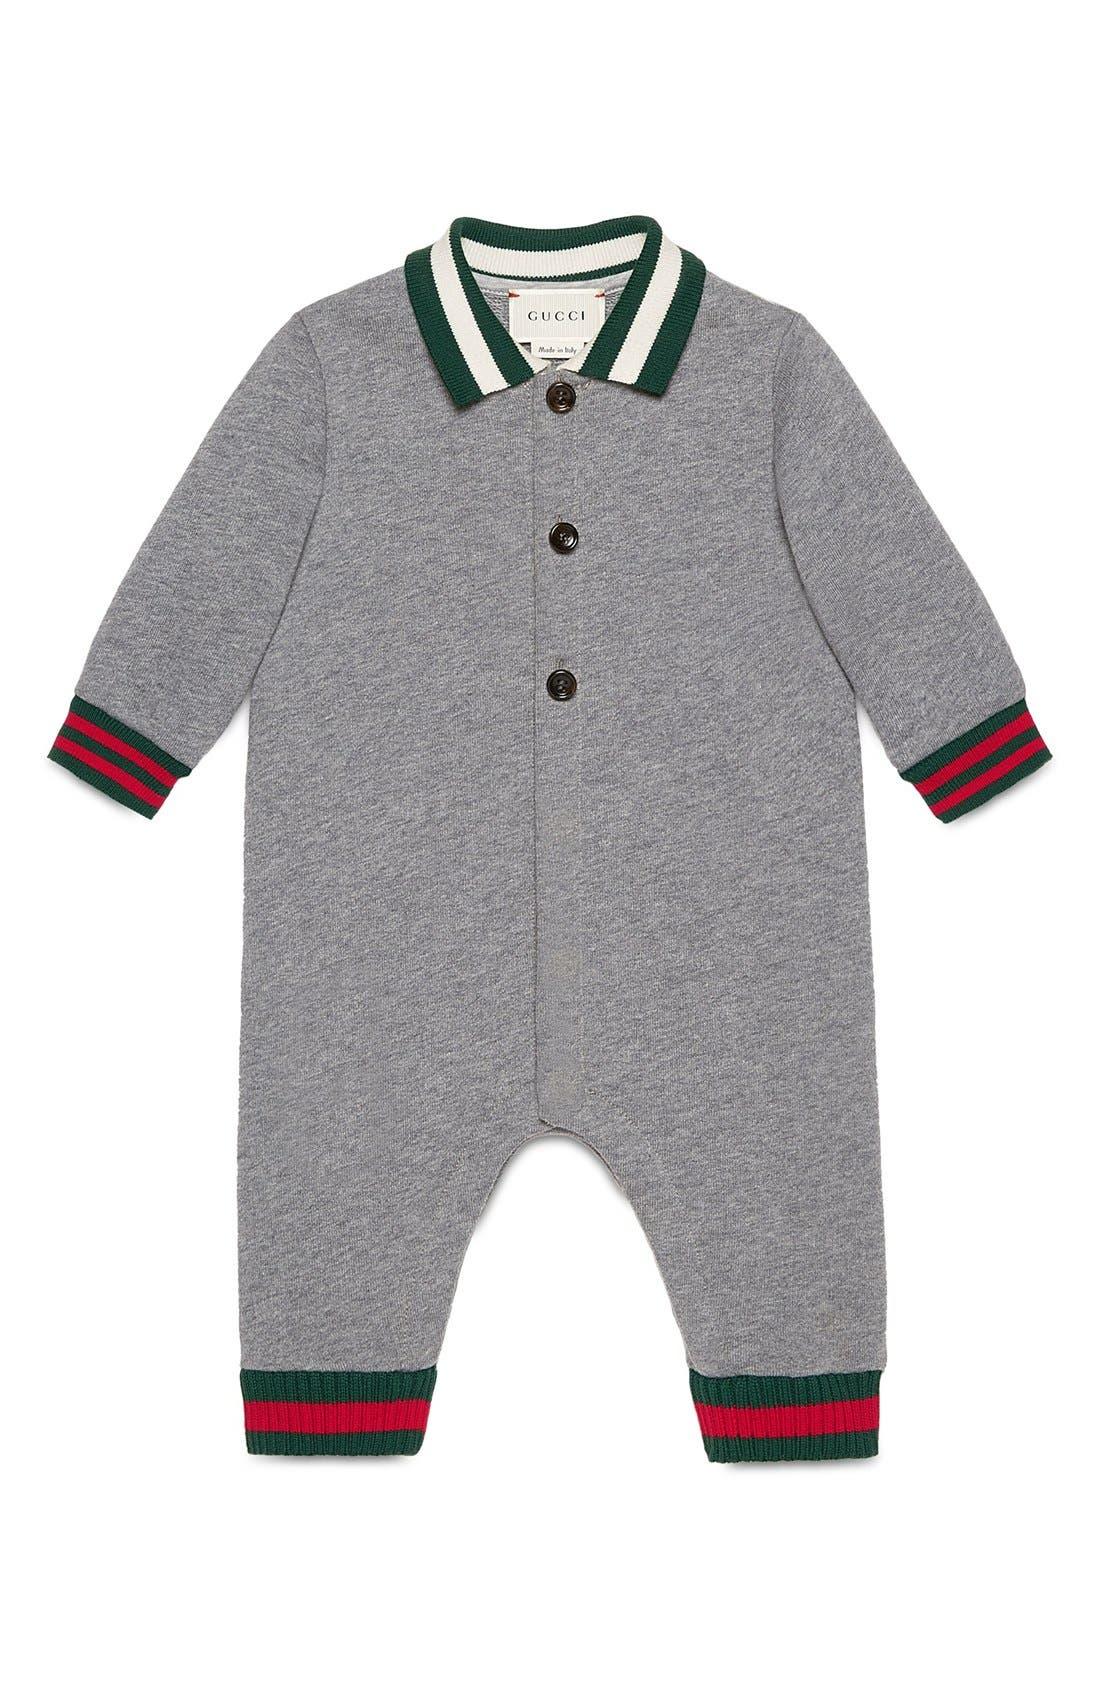 Gucci Knit Romper (Baby Boys)